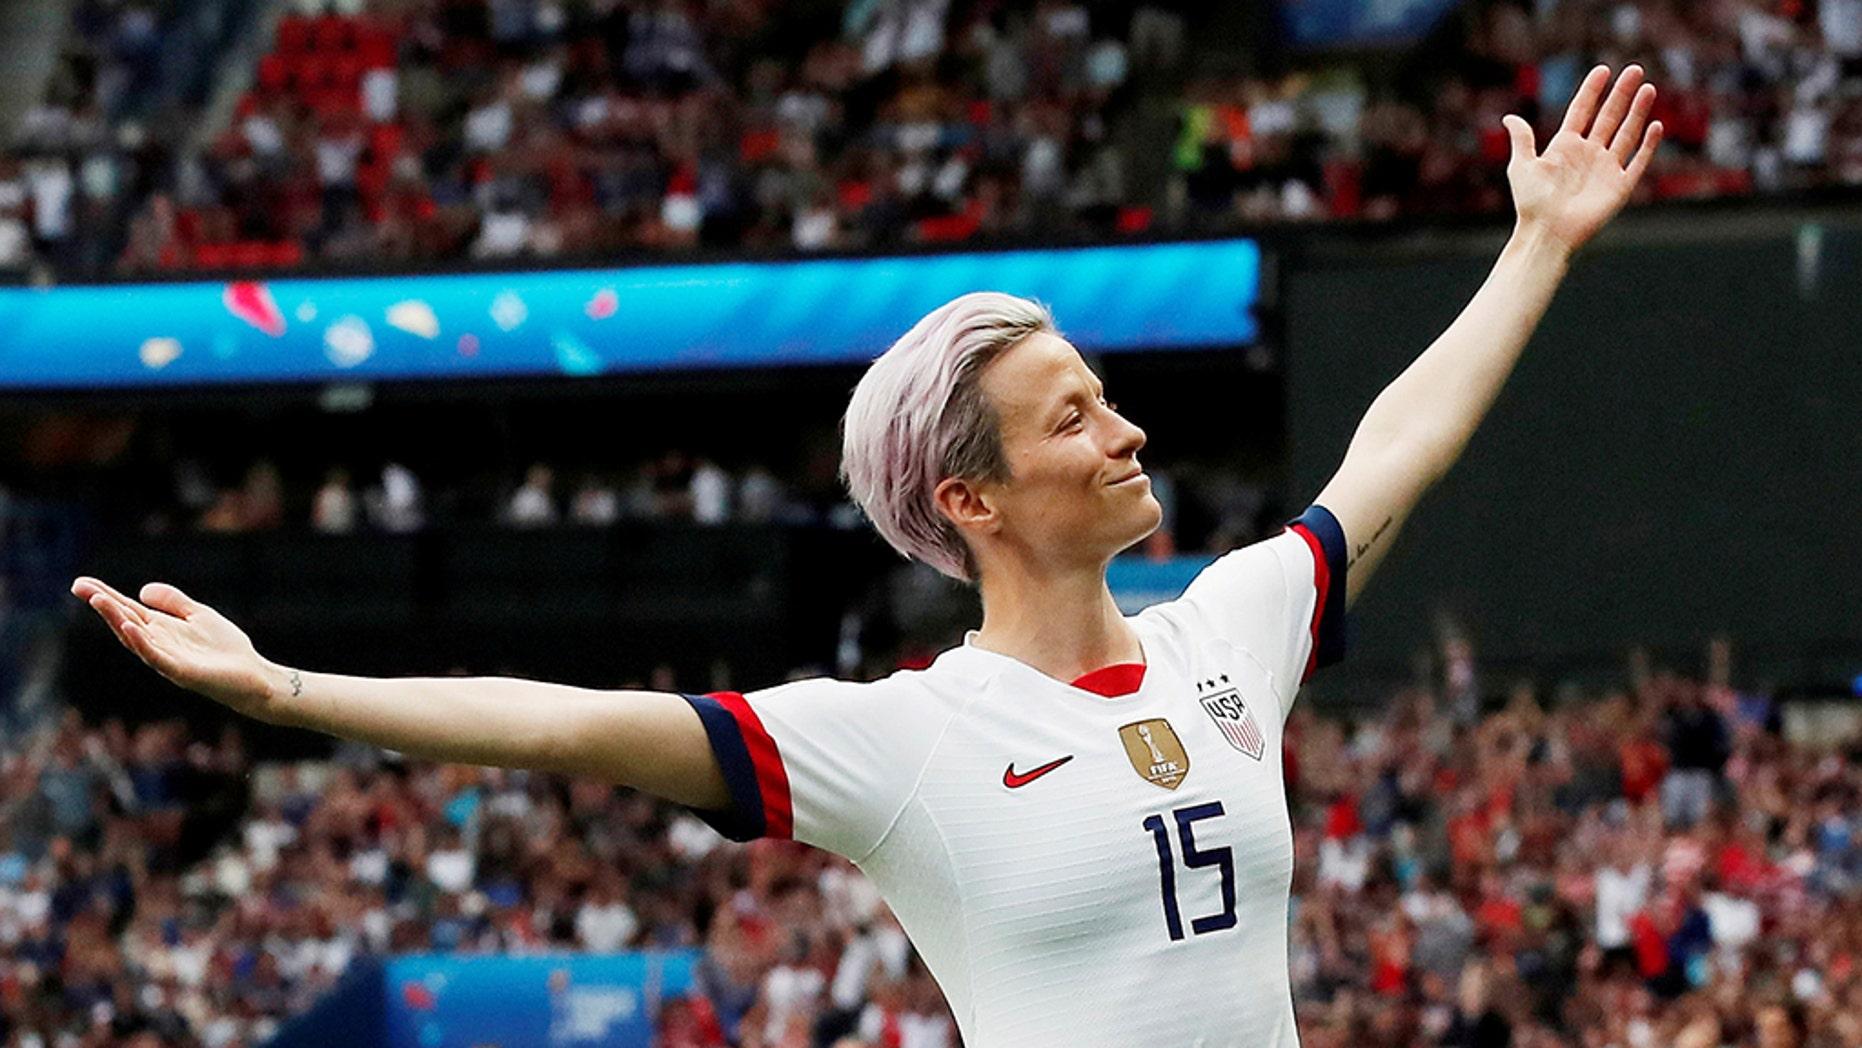 Megan Rapinoe of the U.S. celebrates scoring a goal last month. (Reuters)